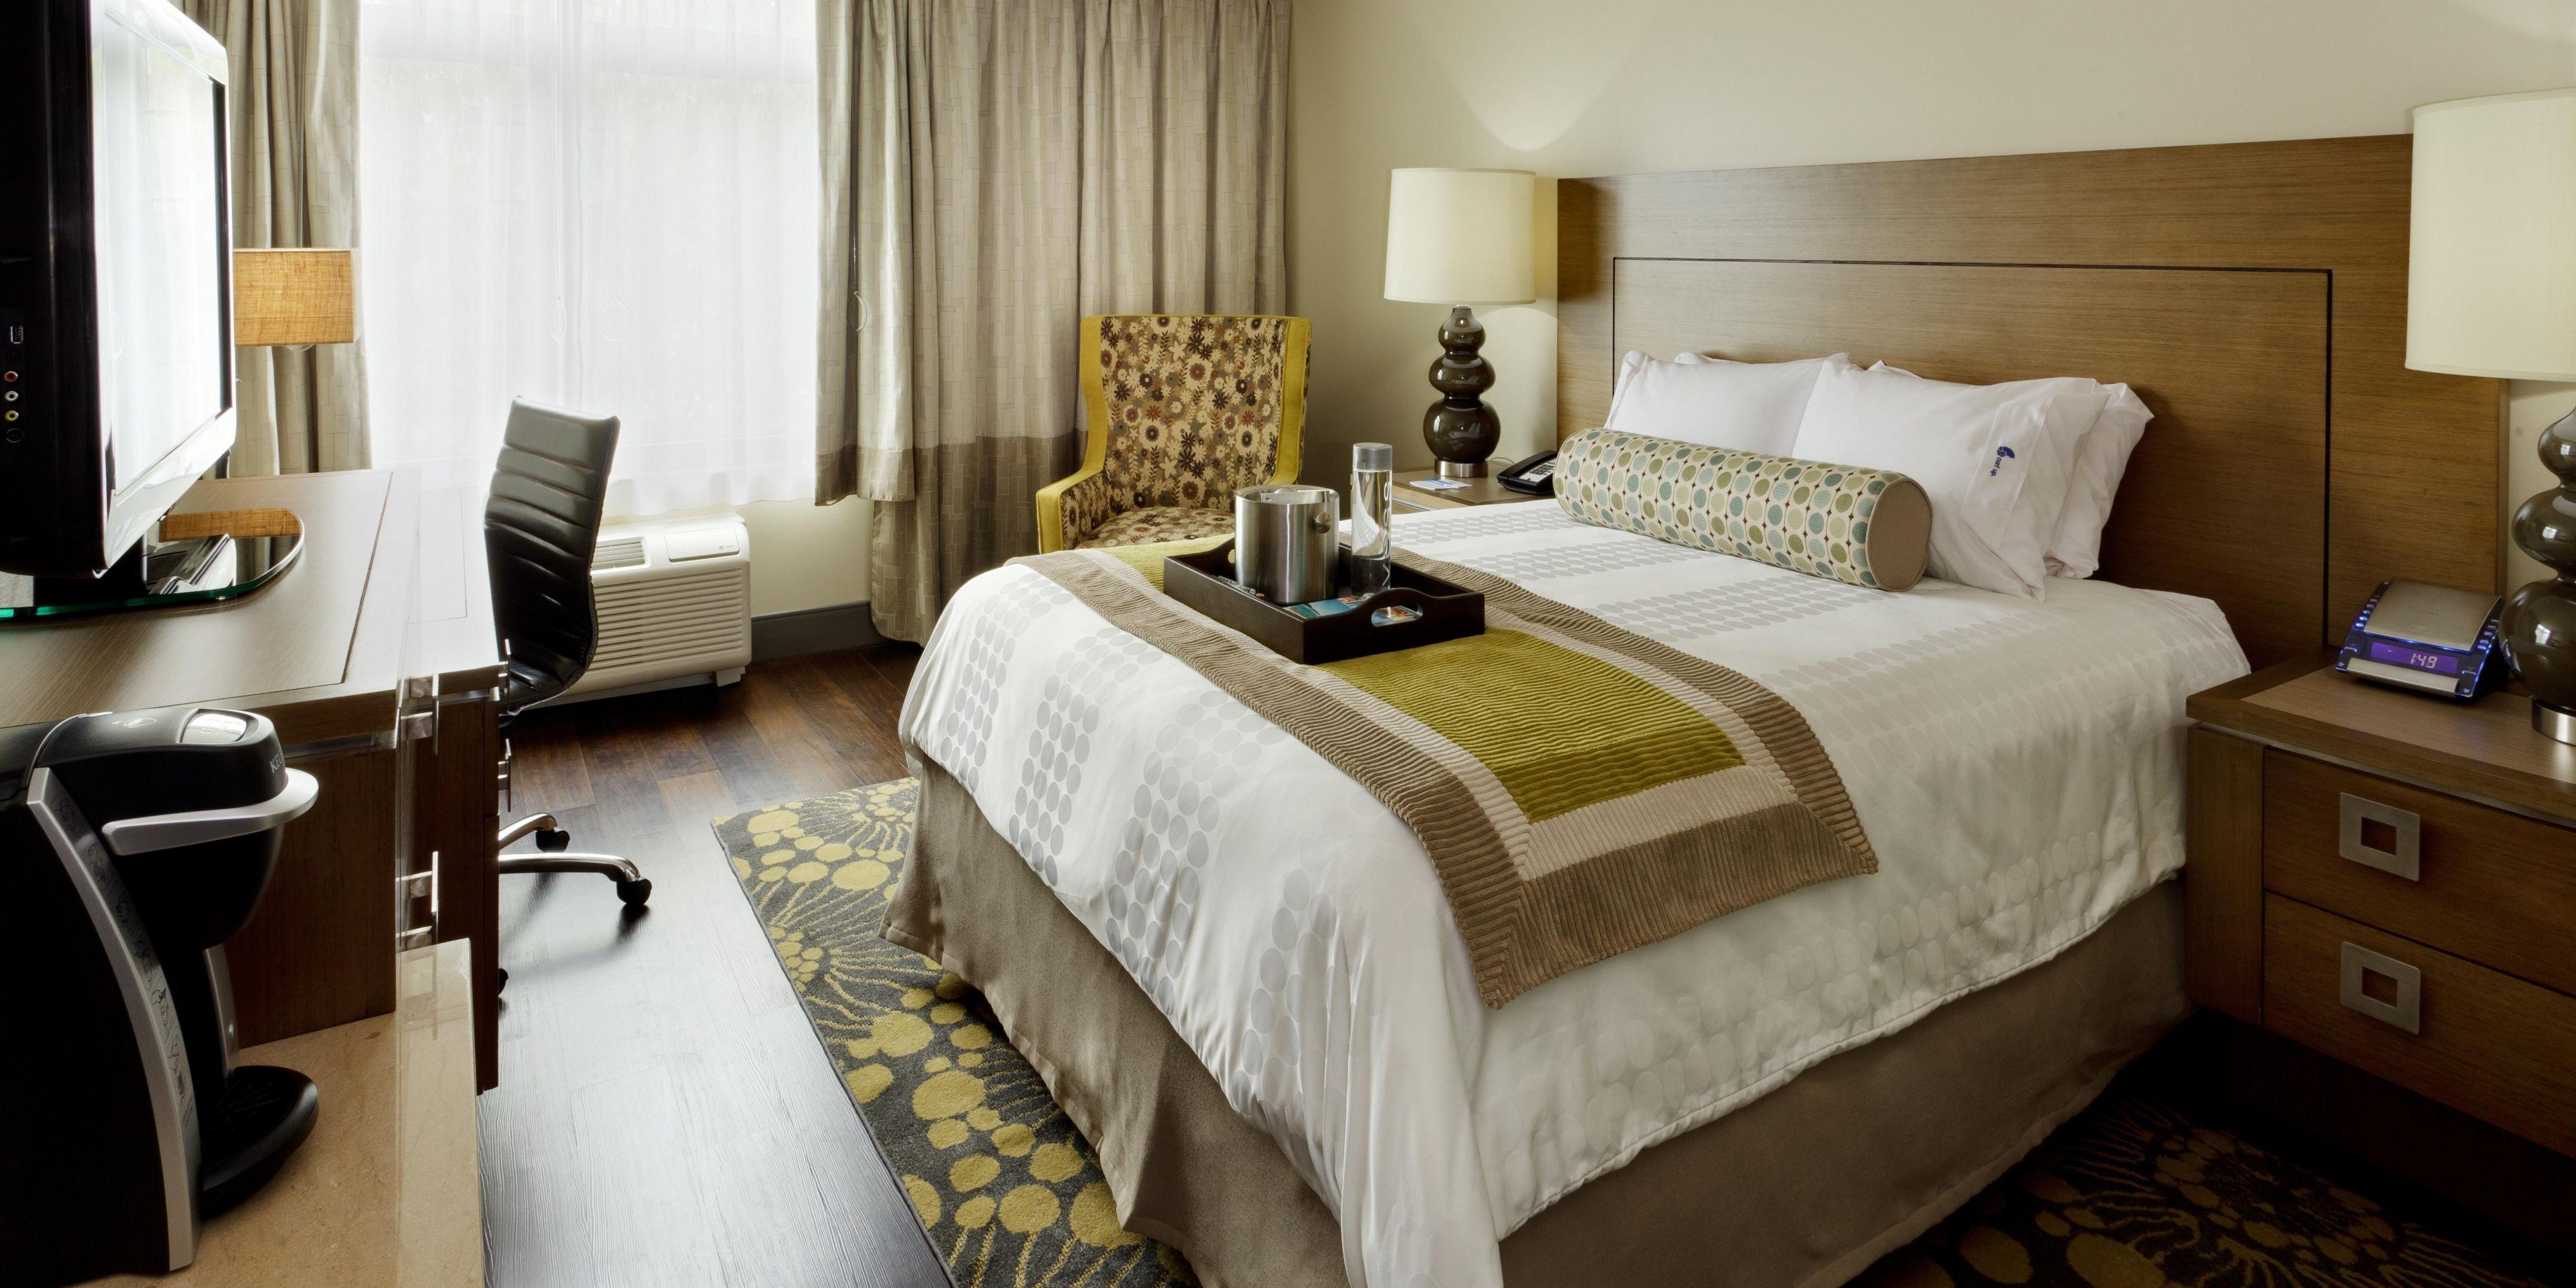 Hotel Indigo Long Island - East End image 1